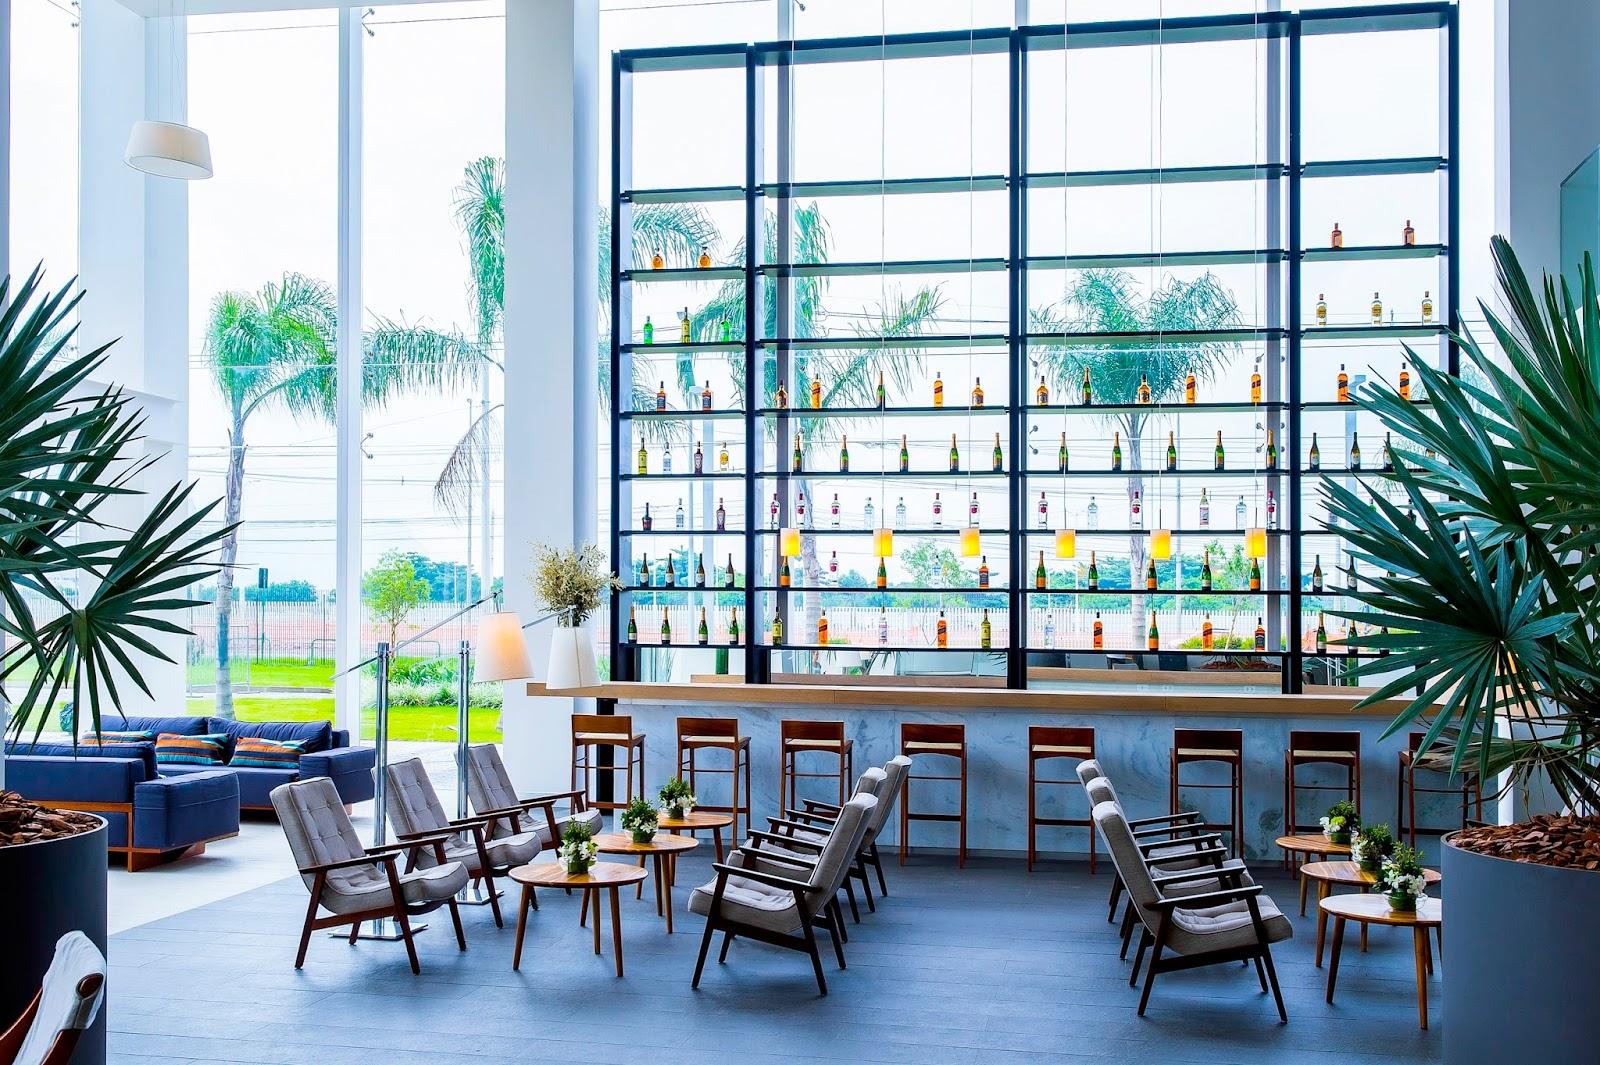 Festas de r veillon 2019 hotel grand mercure promove for Design hotel lizum 1600